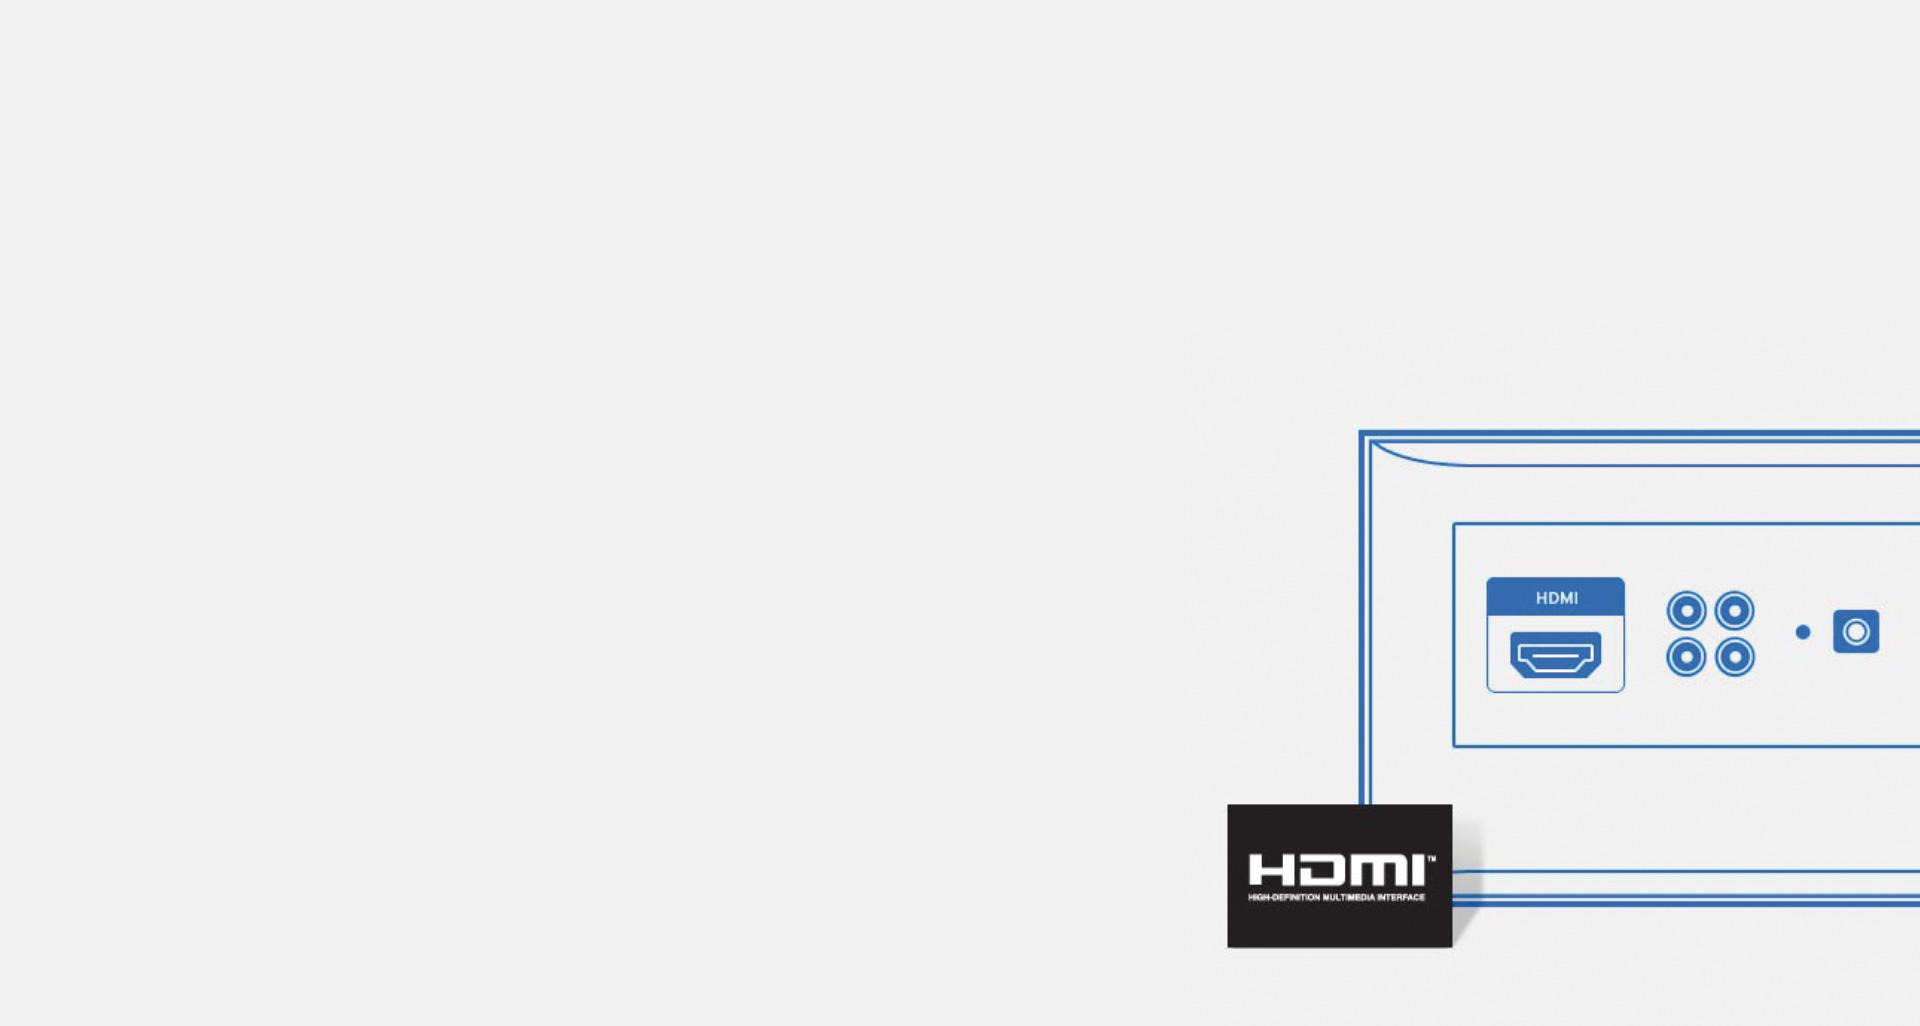 تلویزیون سری J سامسونگ با ورودی HDMI